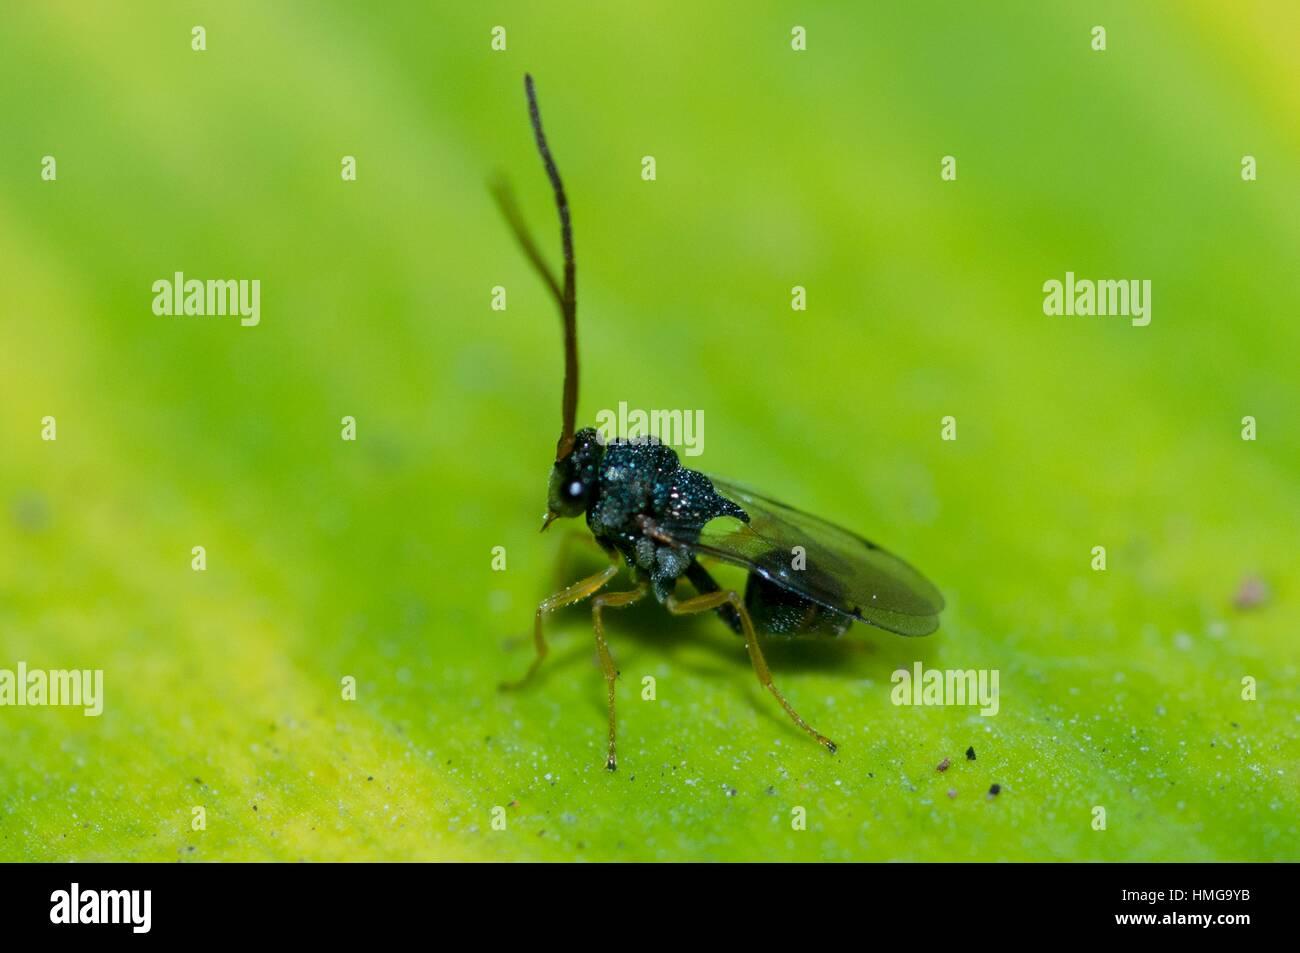 Eucharatid (parasitic) Wasp (Hymenoptera order, Eucharitidae family), Klungkung, Bali, Indonesia. - Stock Image